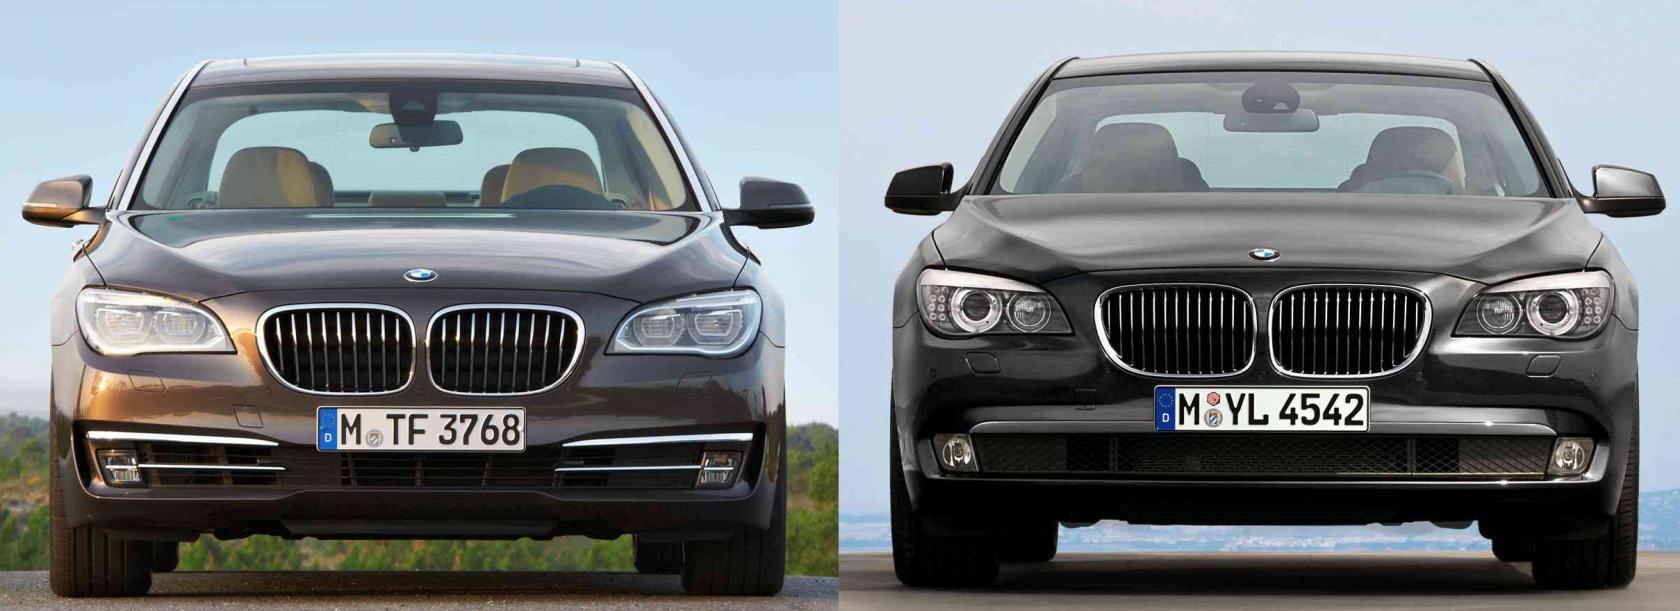 BMW-Serie-7-F01-9.jpeg